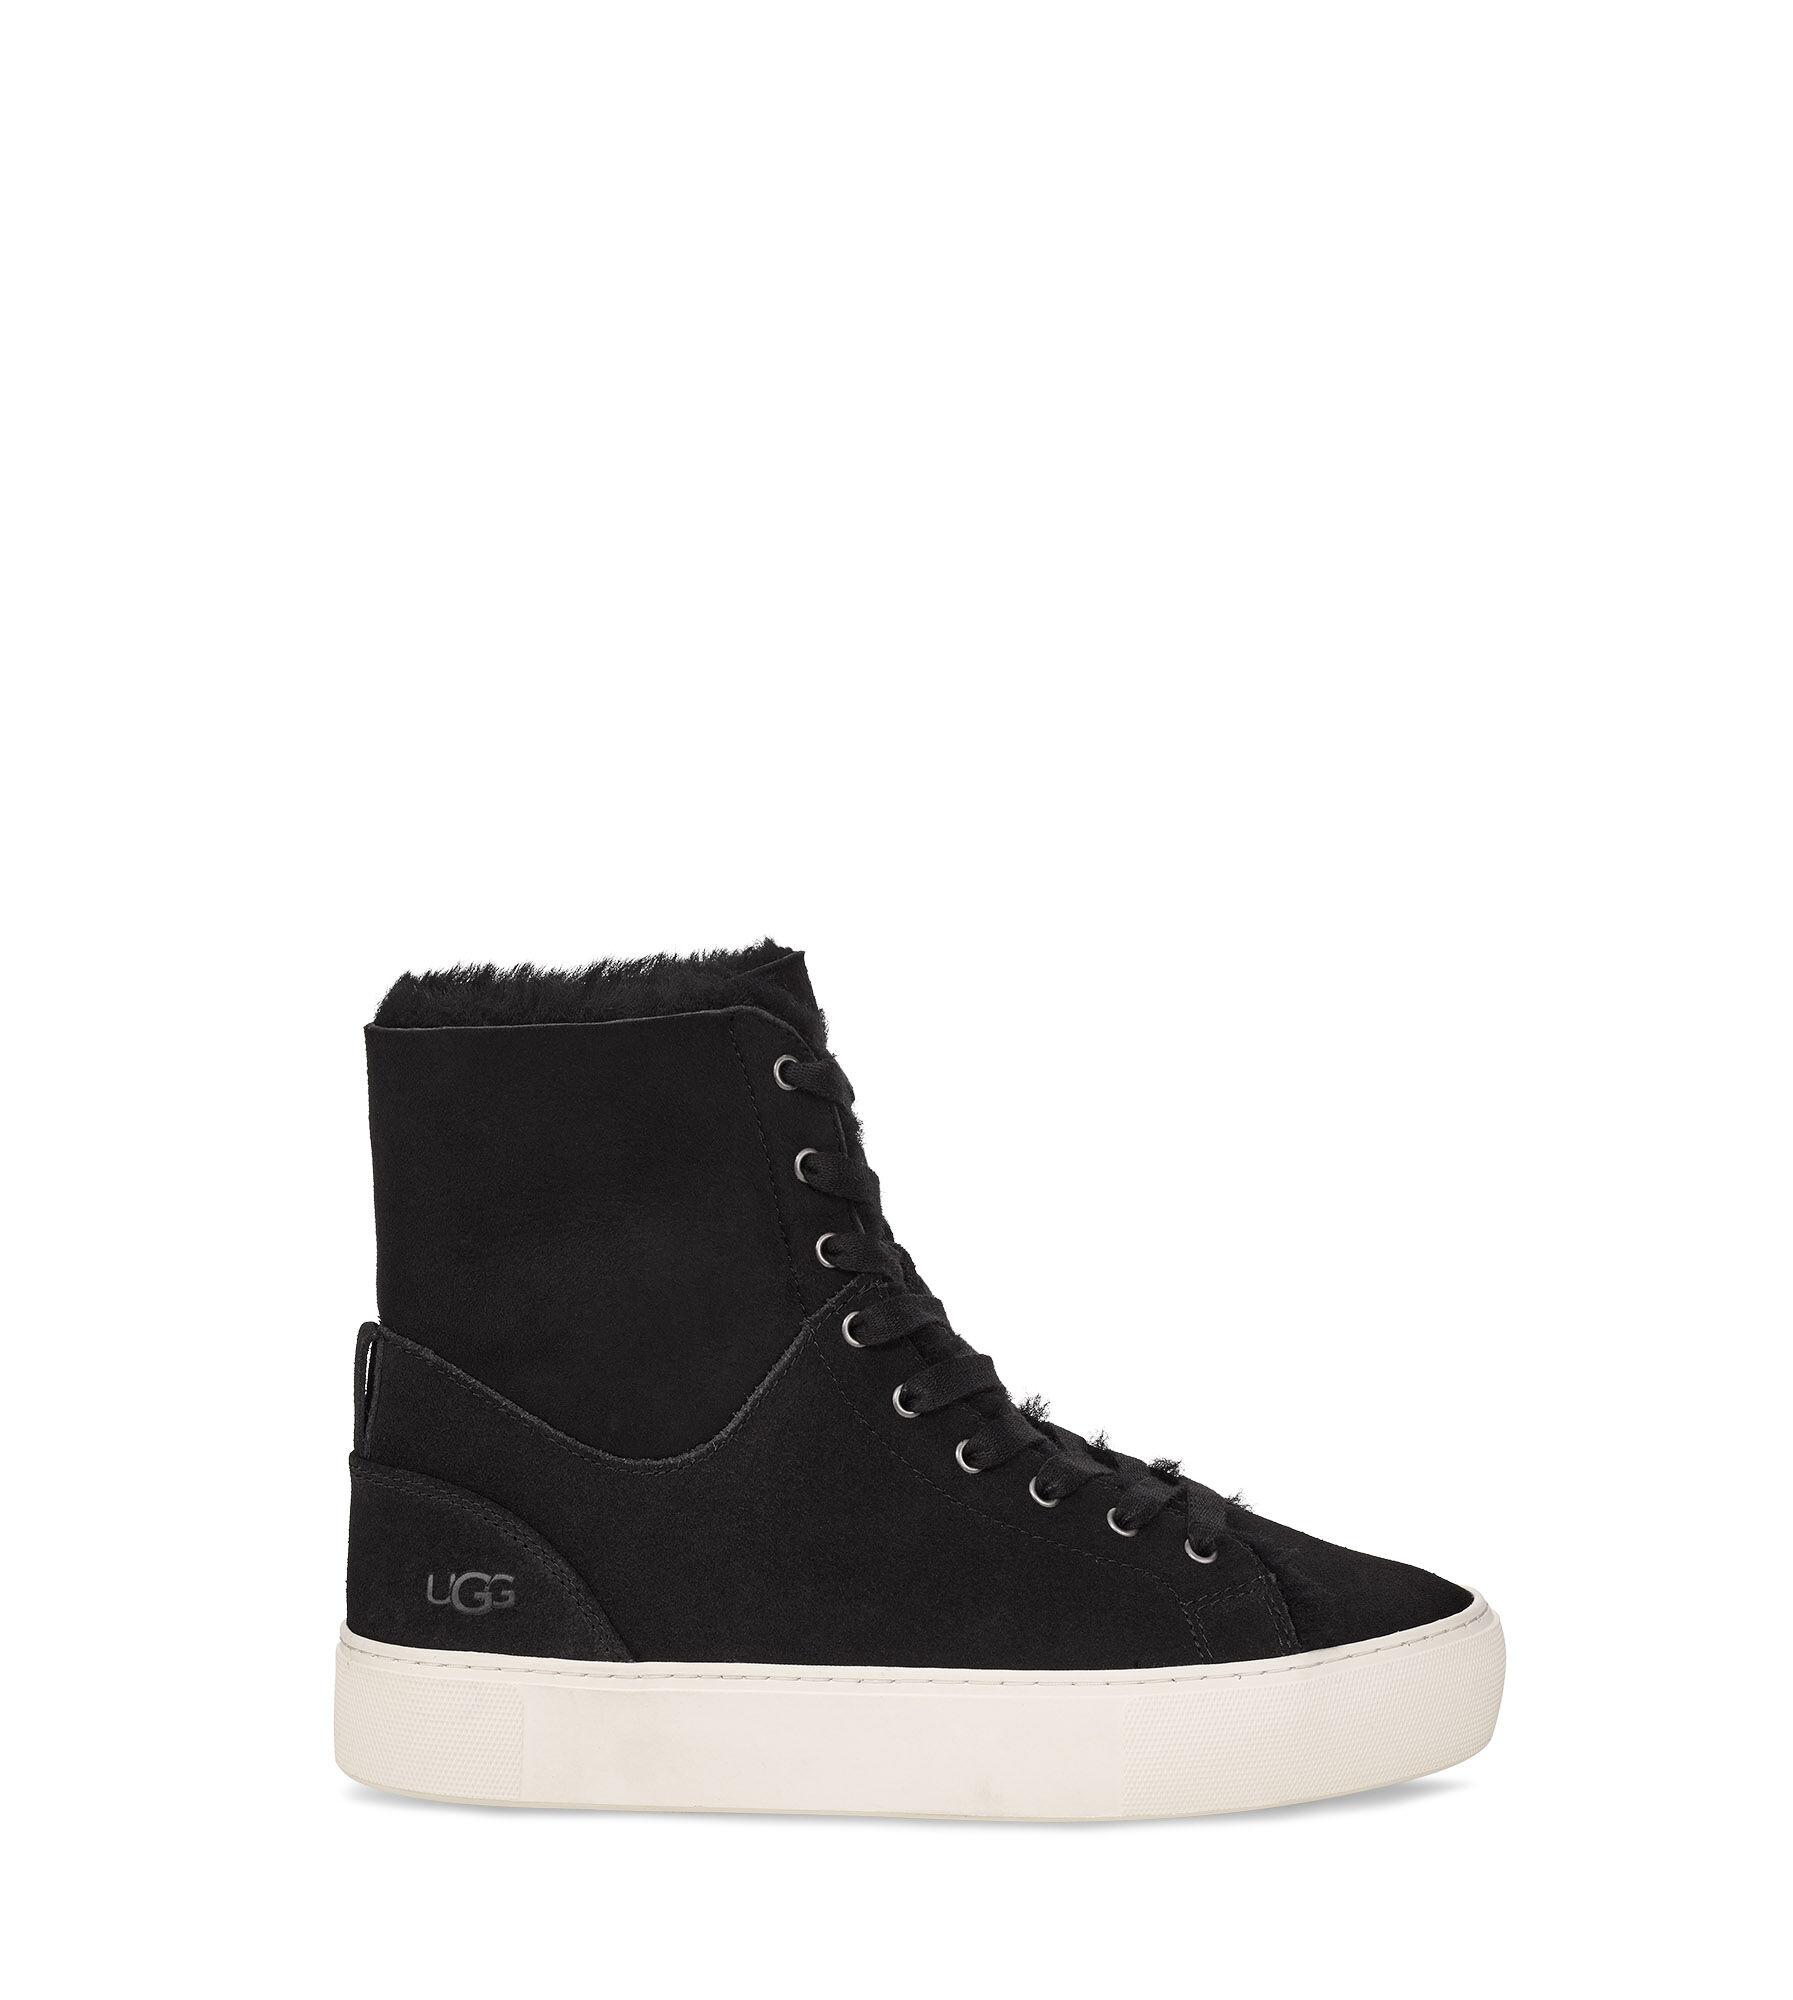 Women's Beven Sneaker | UGG Official®